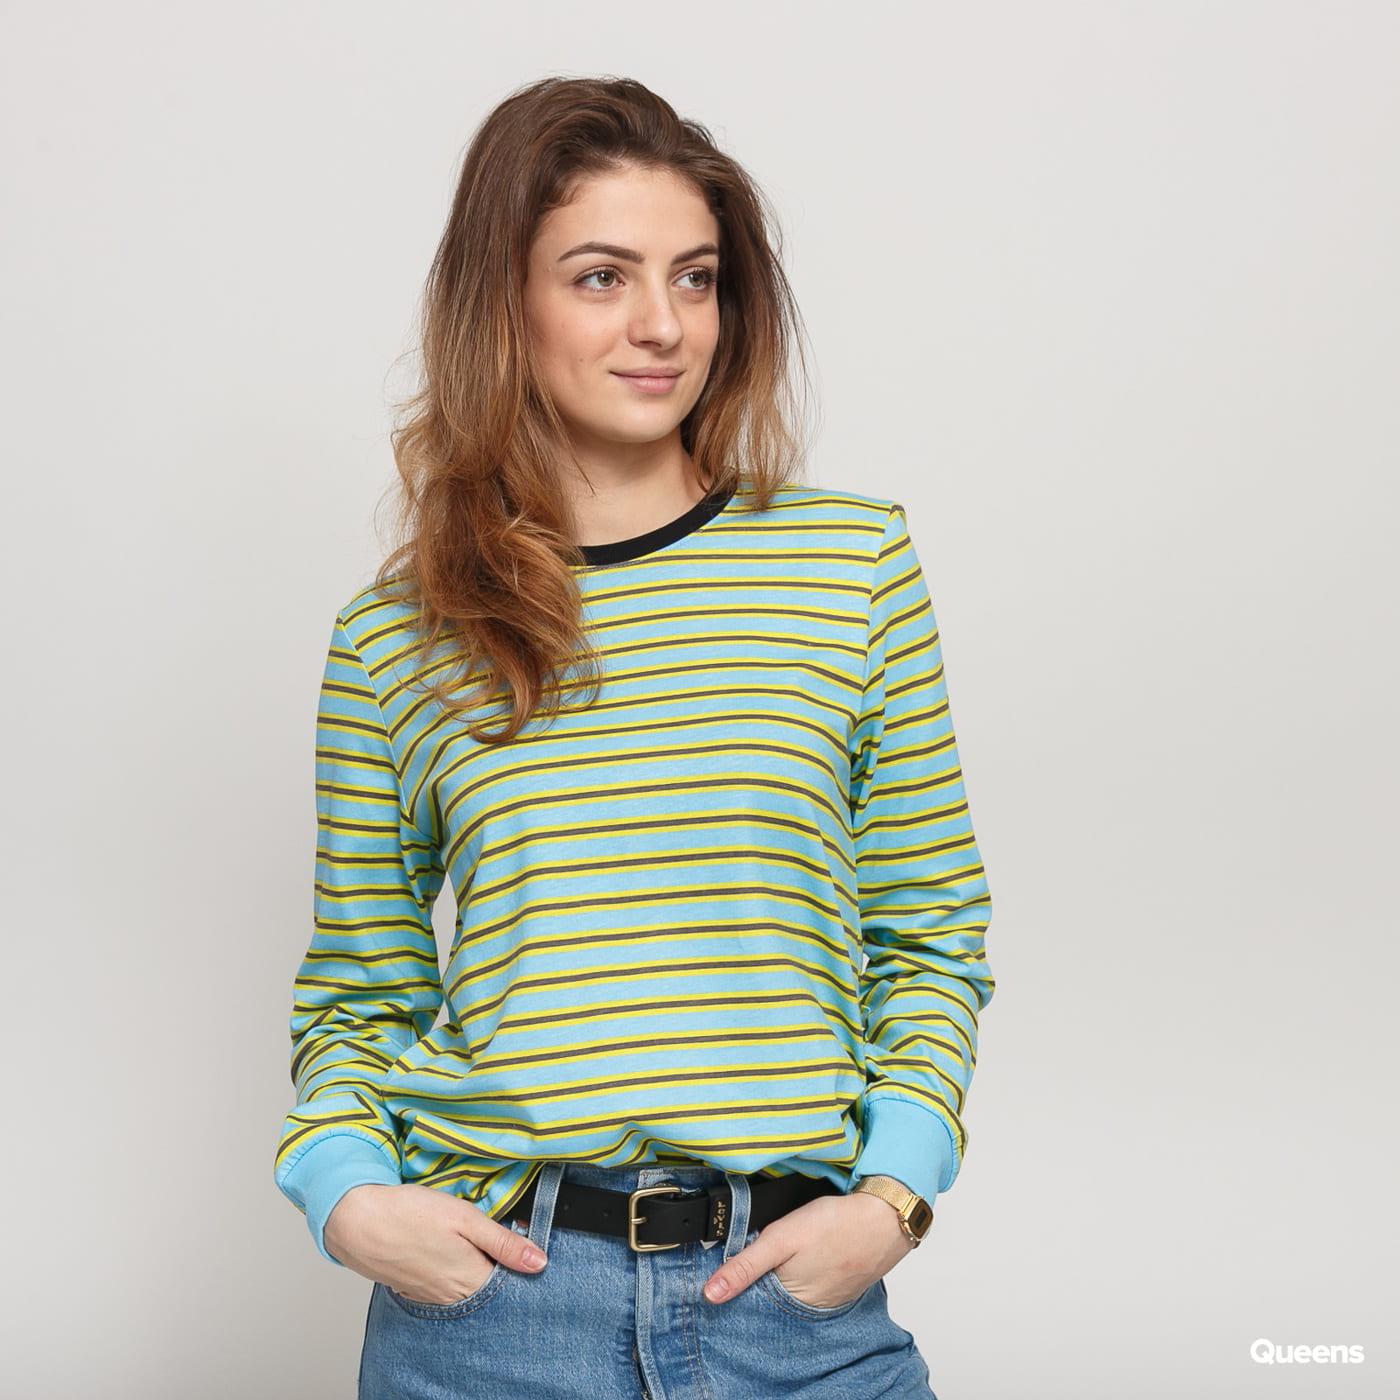 Stüssy Printed Stripe LS Tee light blue / yellow / dark gray